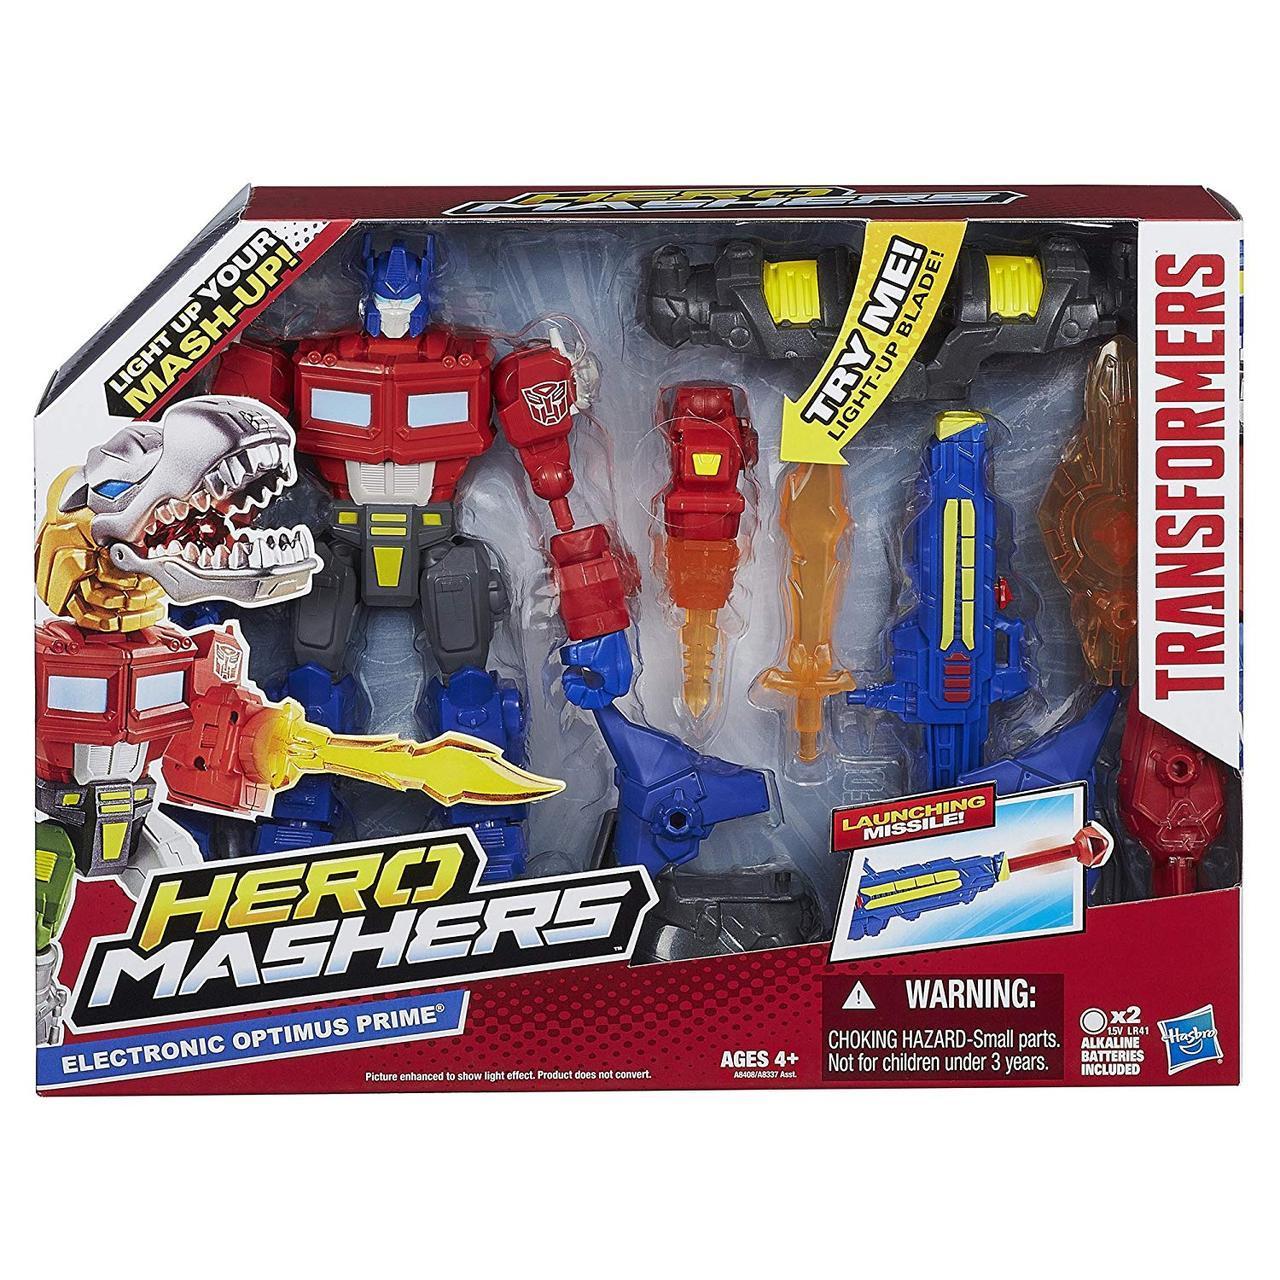 Электронно-разборная фигурка Оптимус Прайм - Optimus Prime, Electronic, Hero Mashers, Hasbro